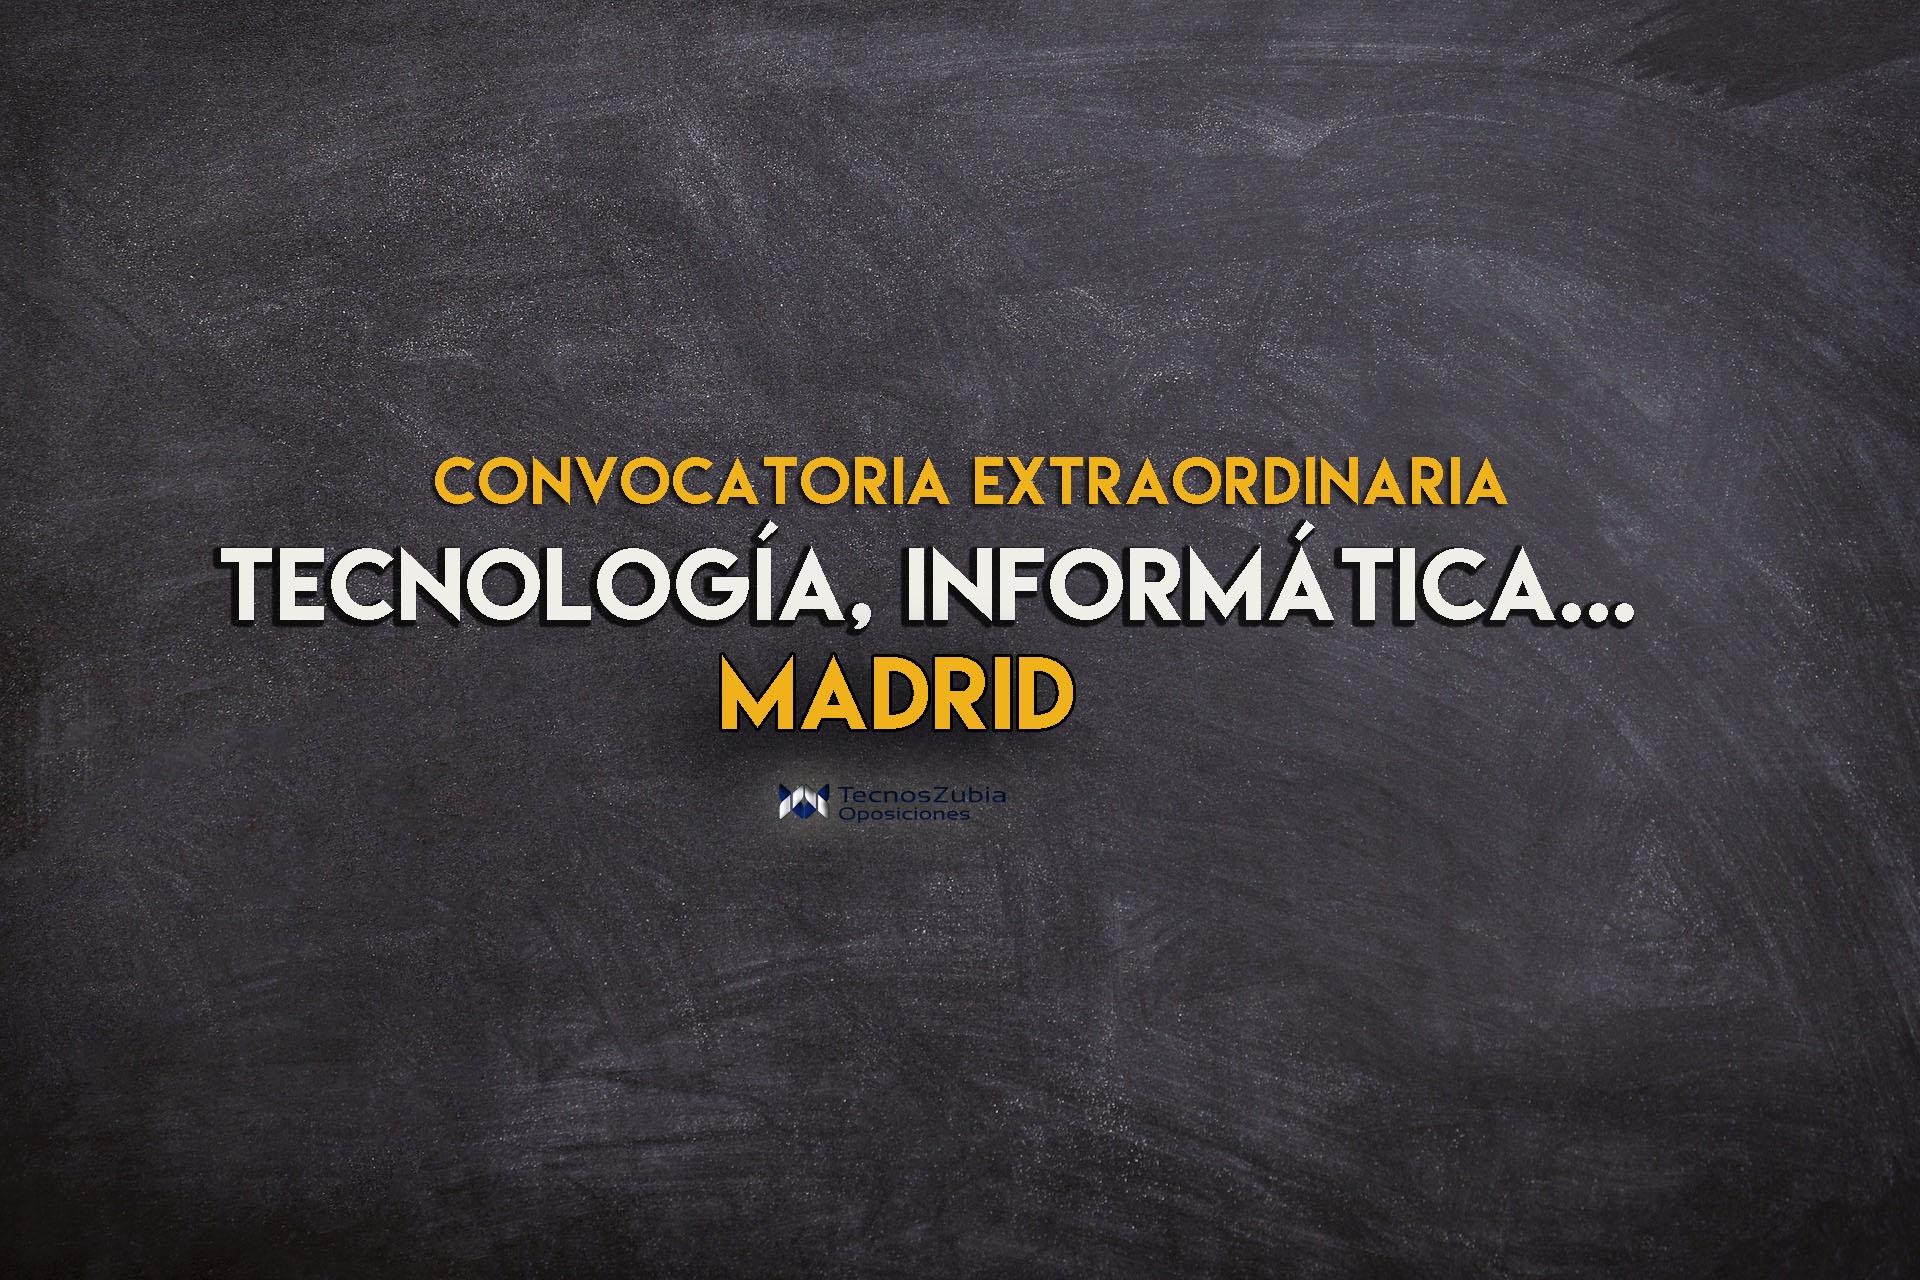 convocatoria extraordinaria de bolsas de Profesores de Enseñanza Secundaria en Madrid